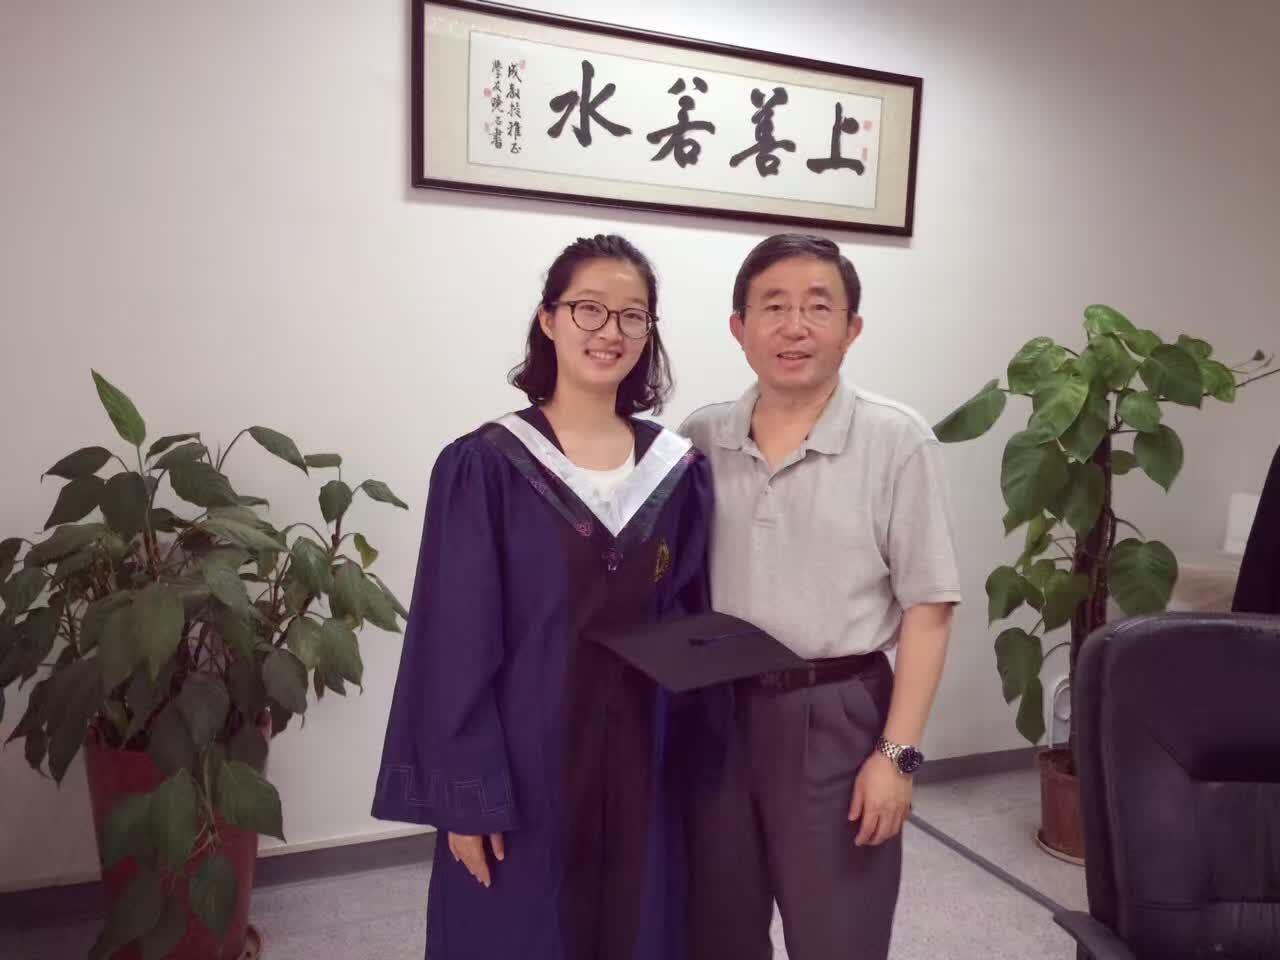 Yingying Zhang (L). (Courtesy of Yingying Zhang's family)